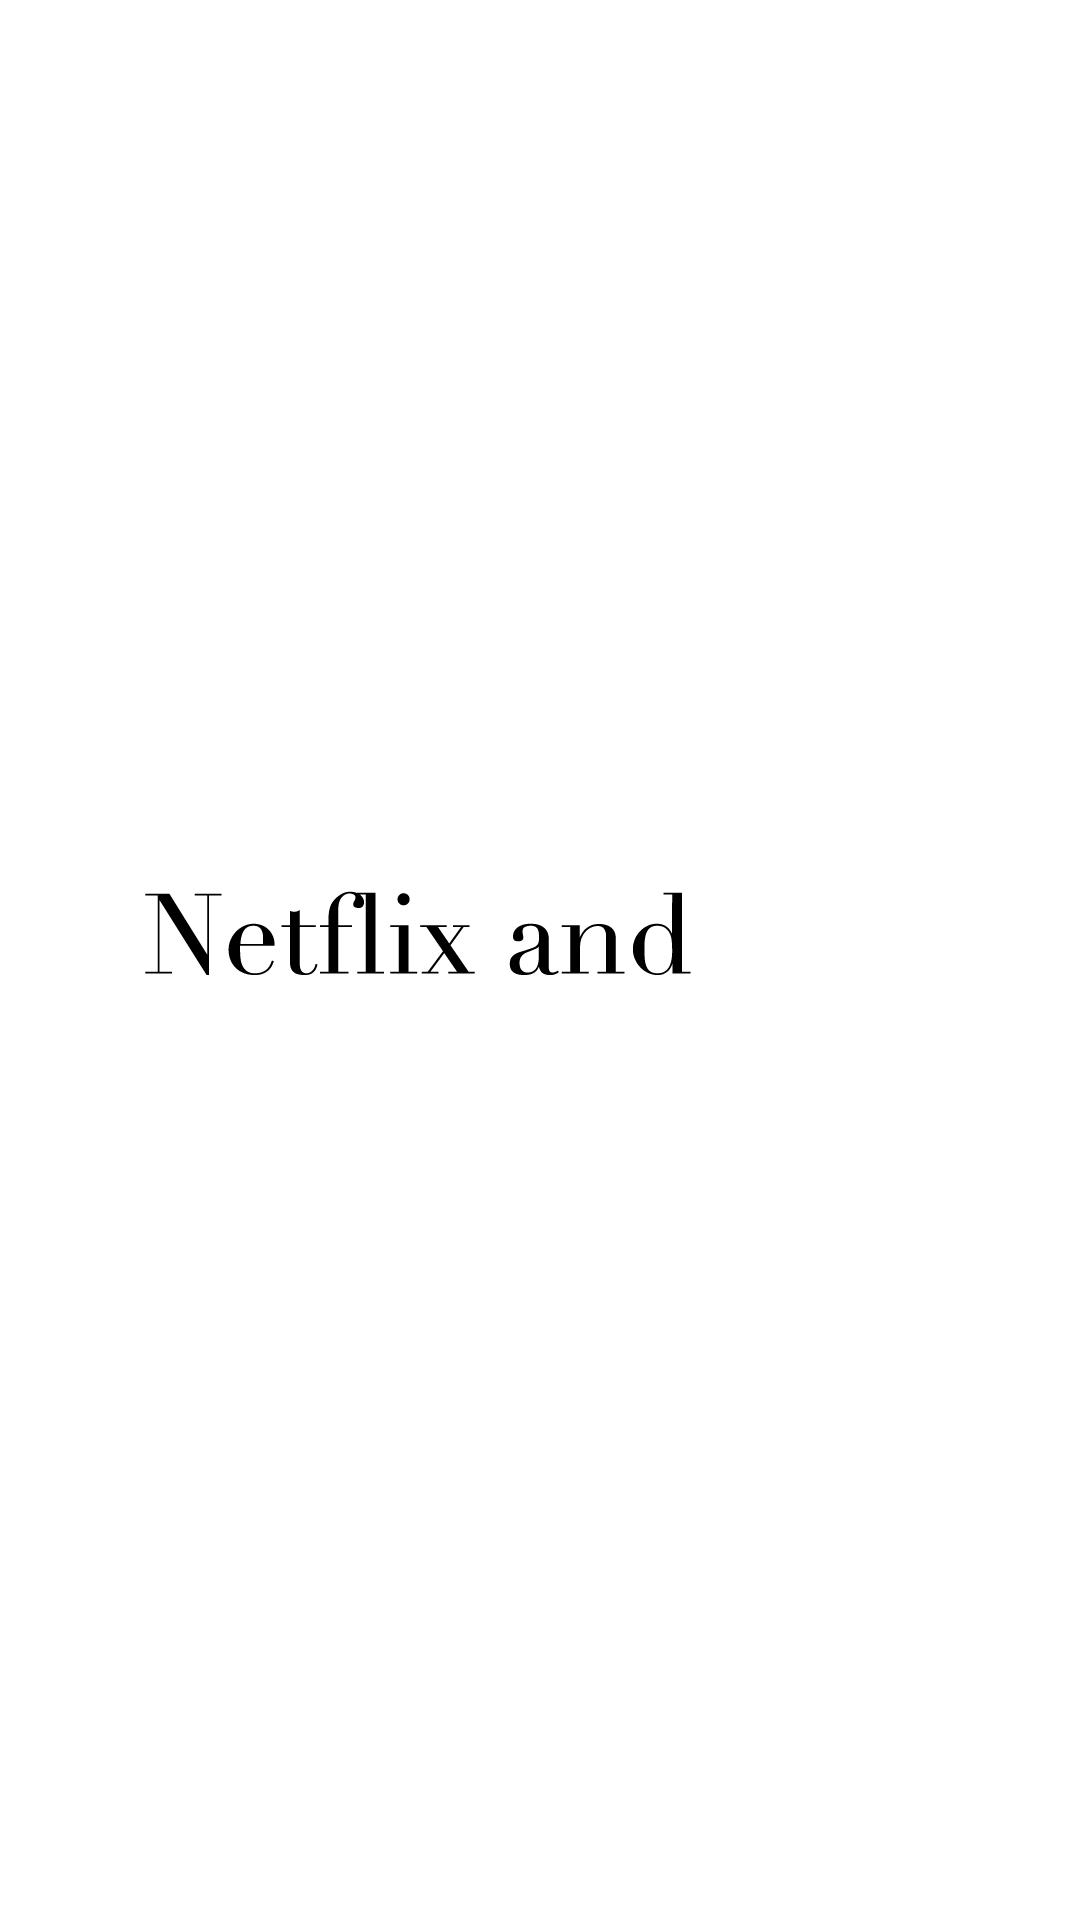 Netflix_001.png